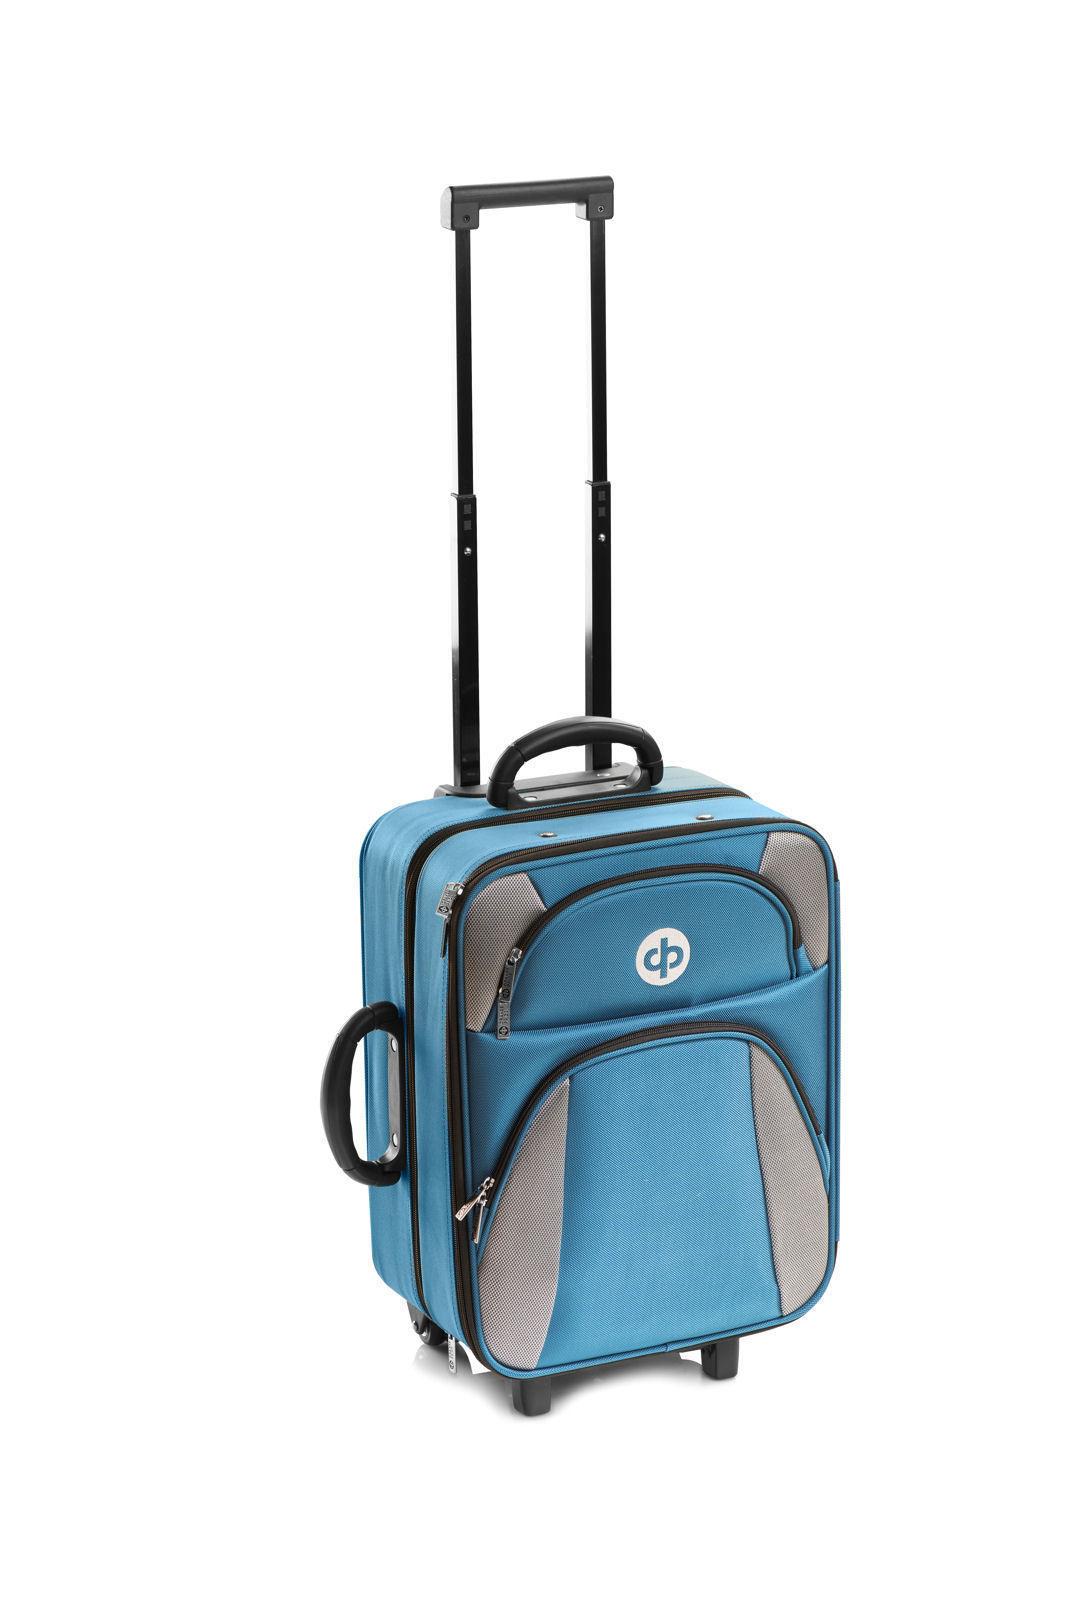 6f3c2a2408ba Drakes Pride High Roller Trolley Bowls Bag